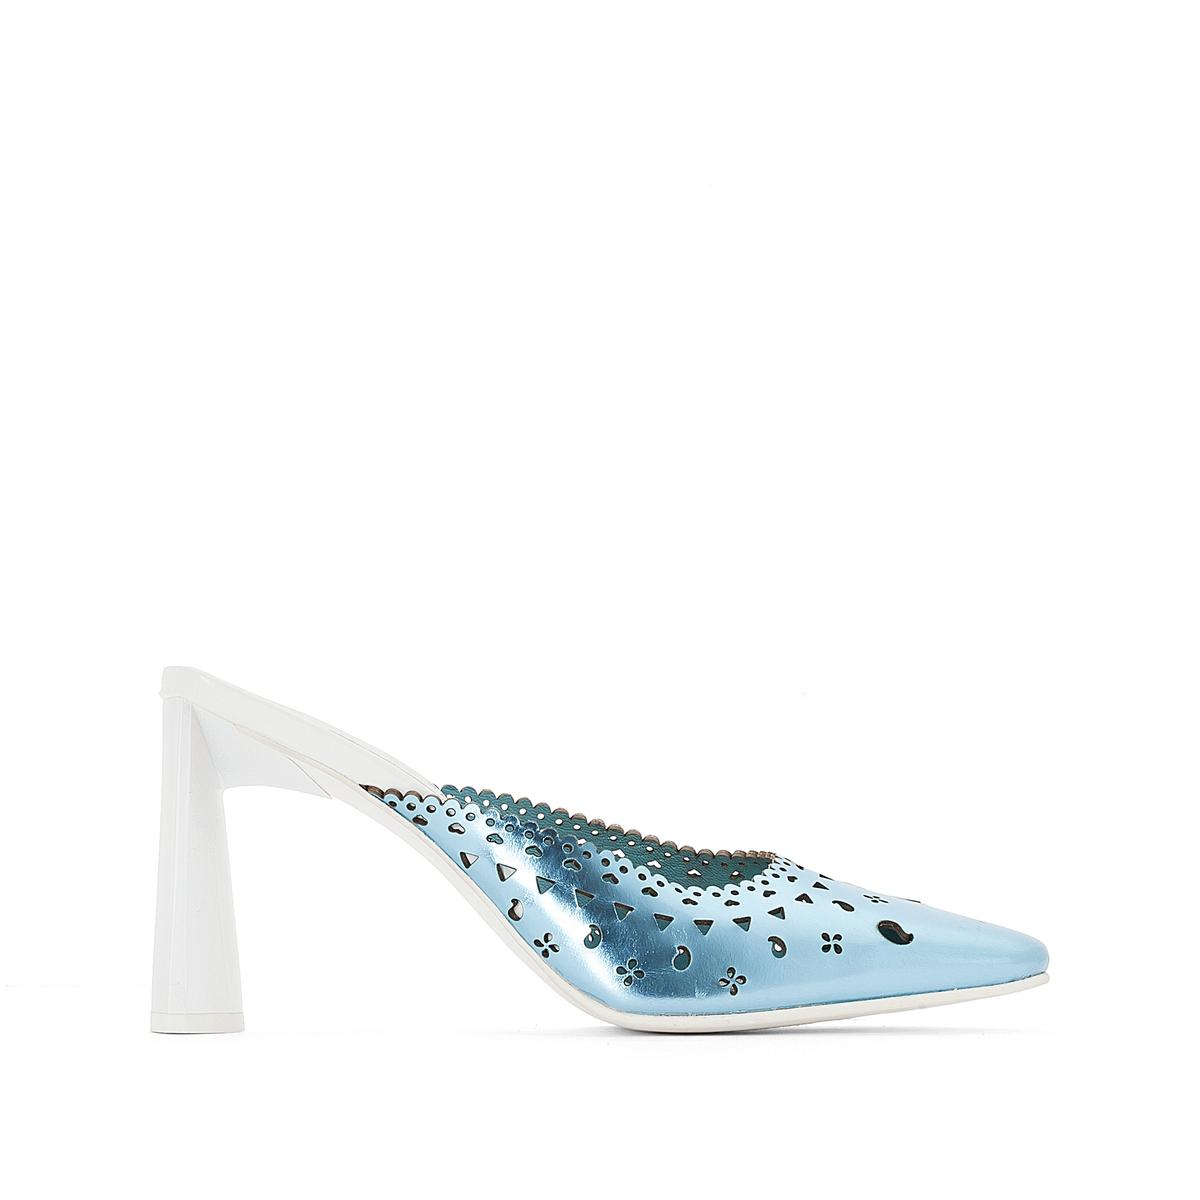 Туфли без задника кожаные от Amélie Pichard x La Redoute